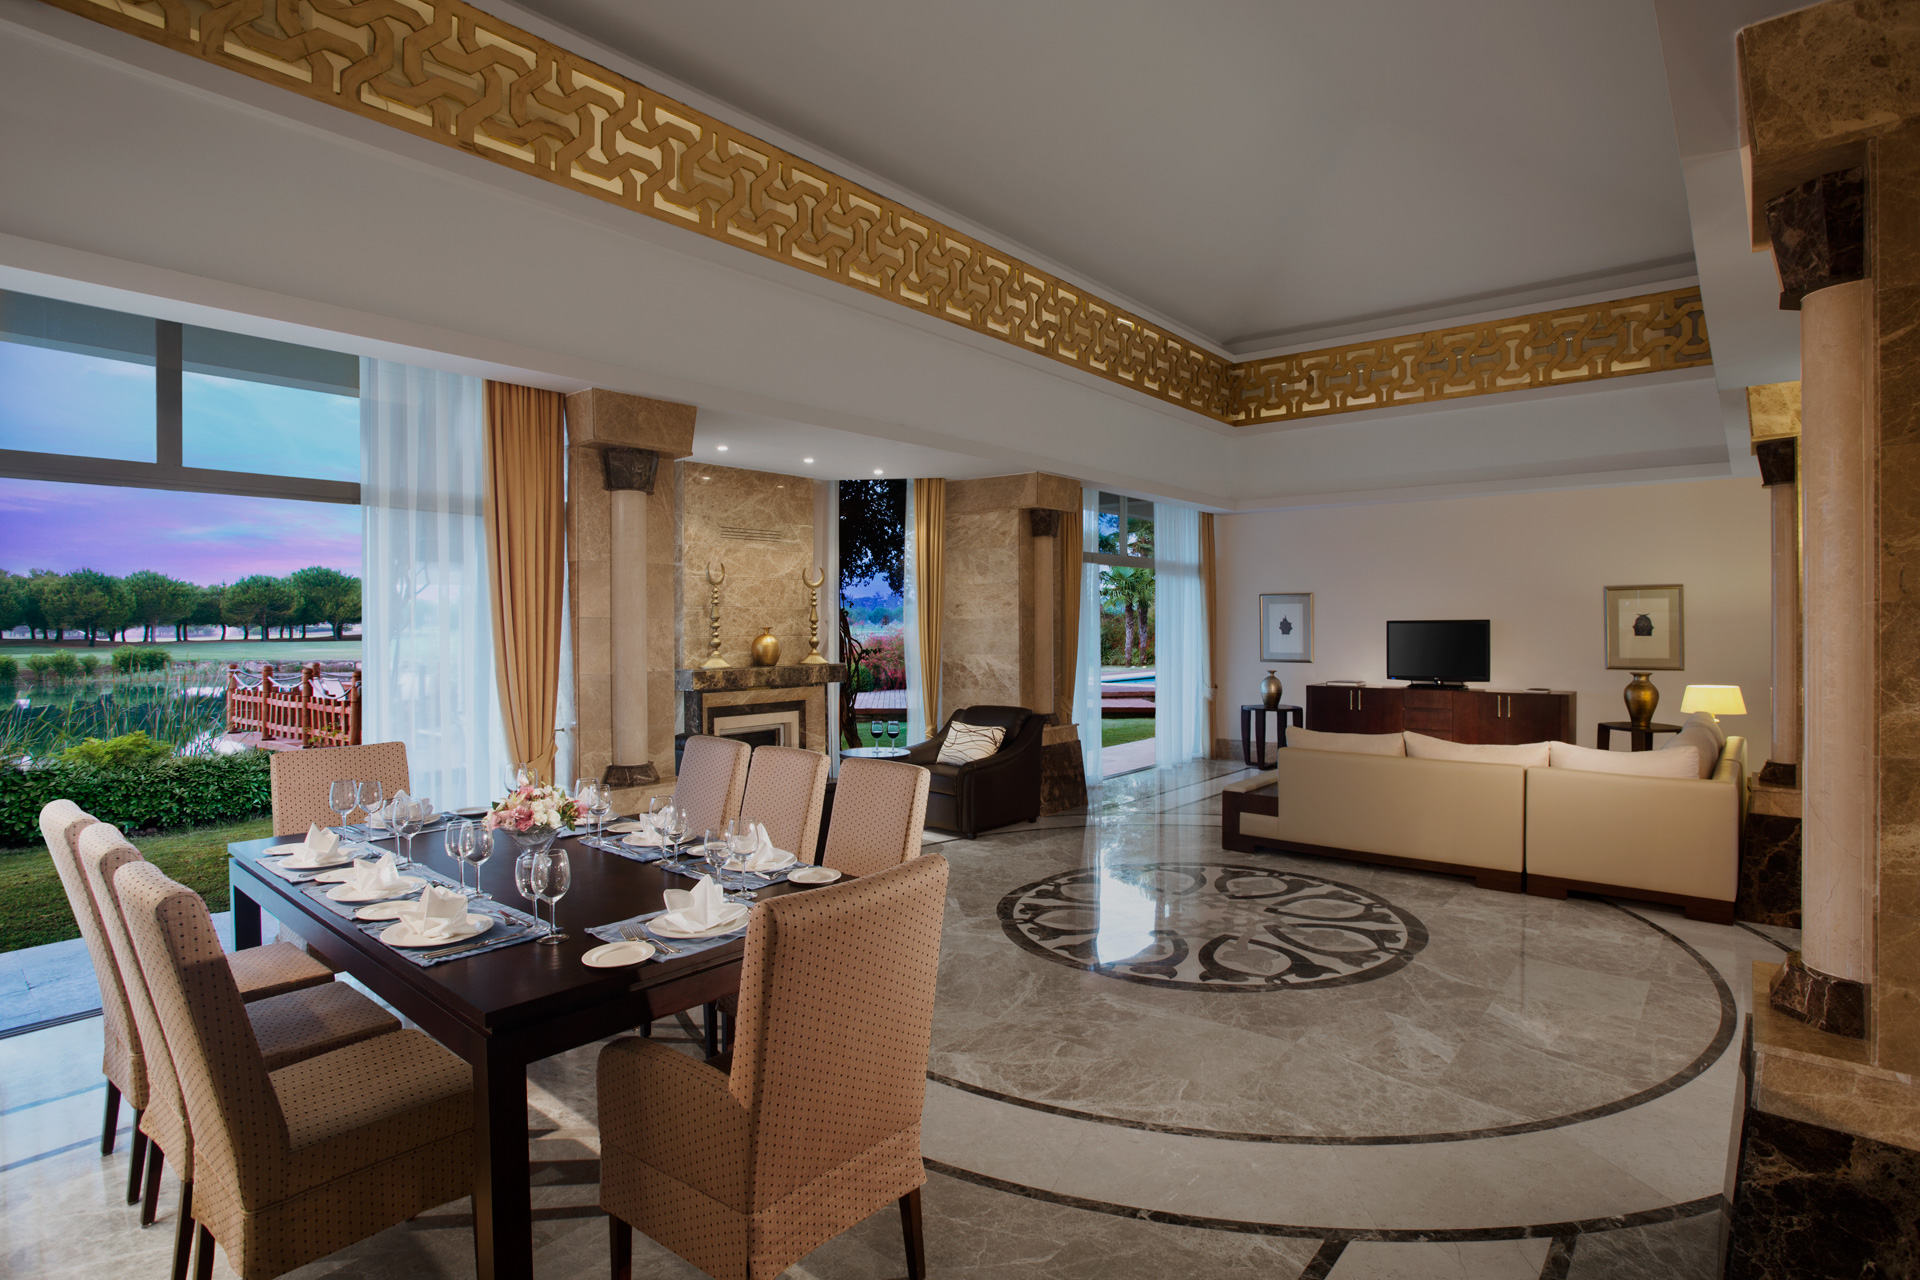 Kempinski Hotel The Dome | Presidential Villa Living Room